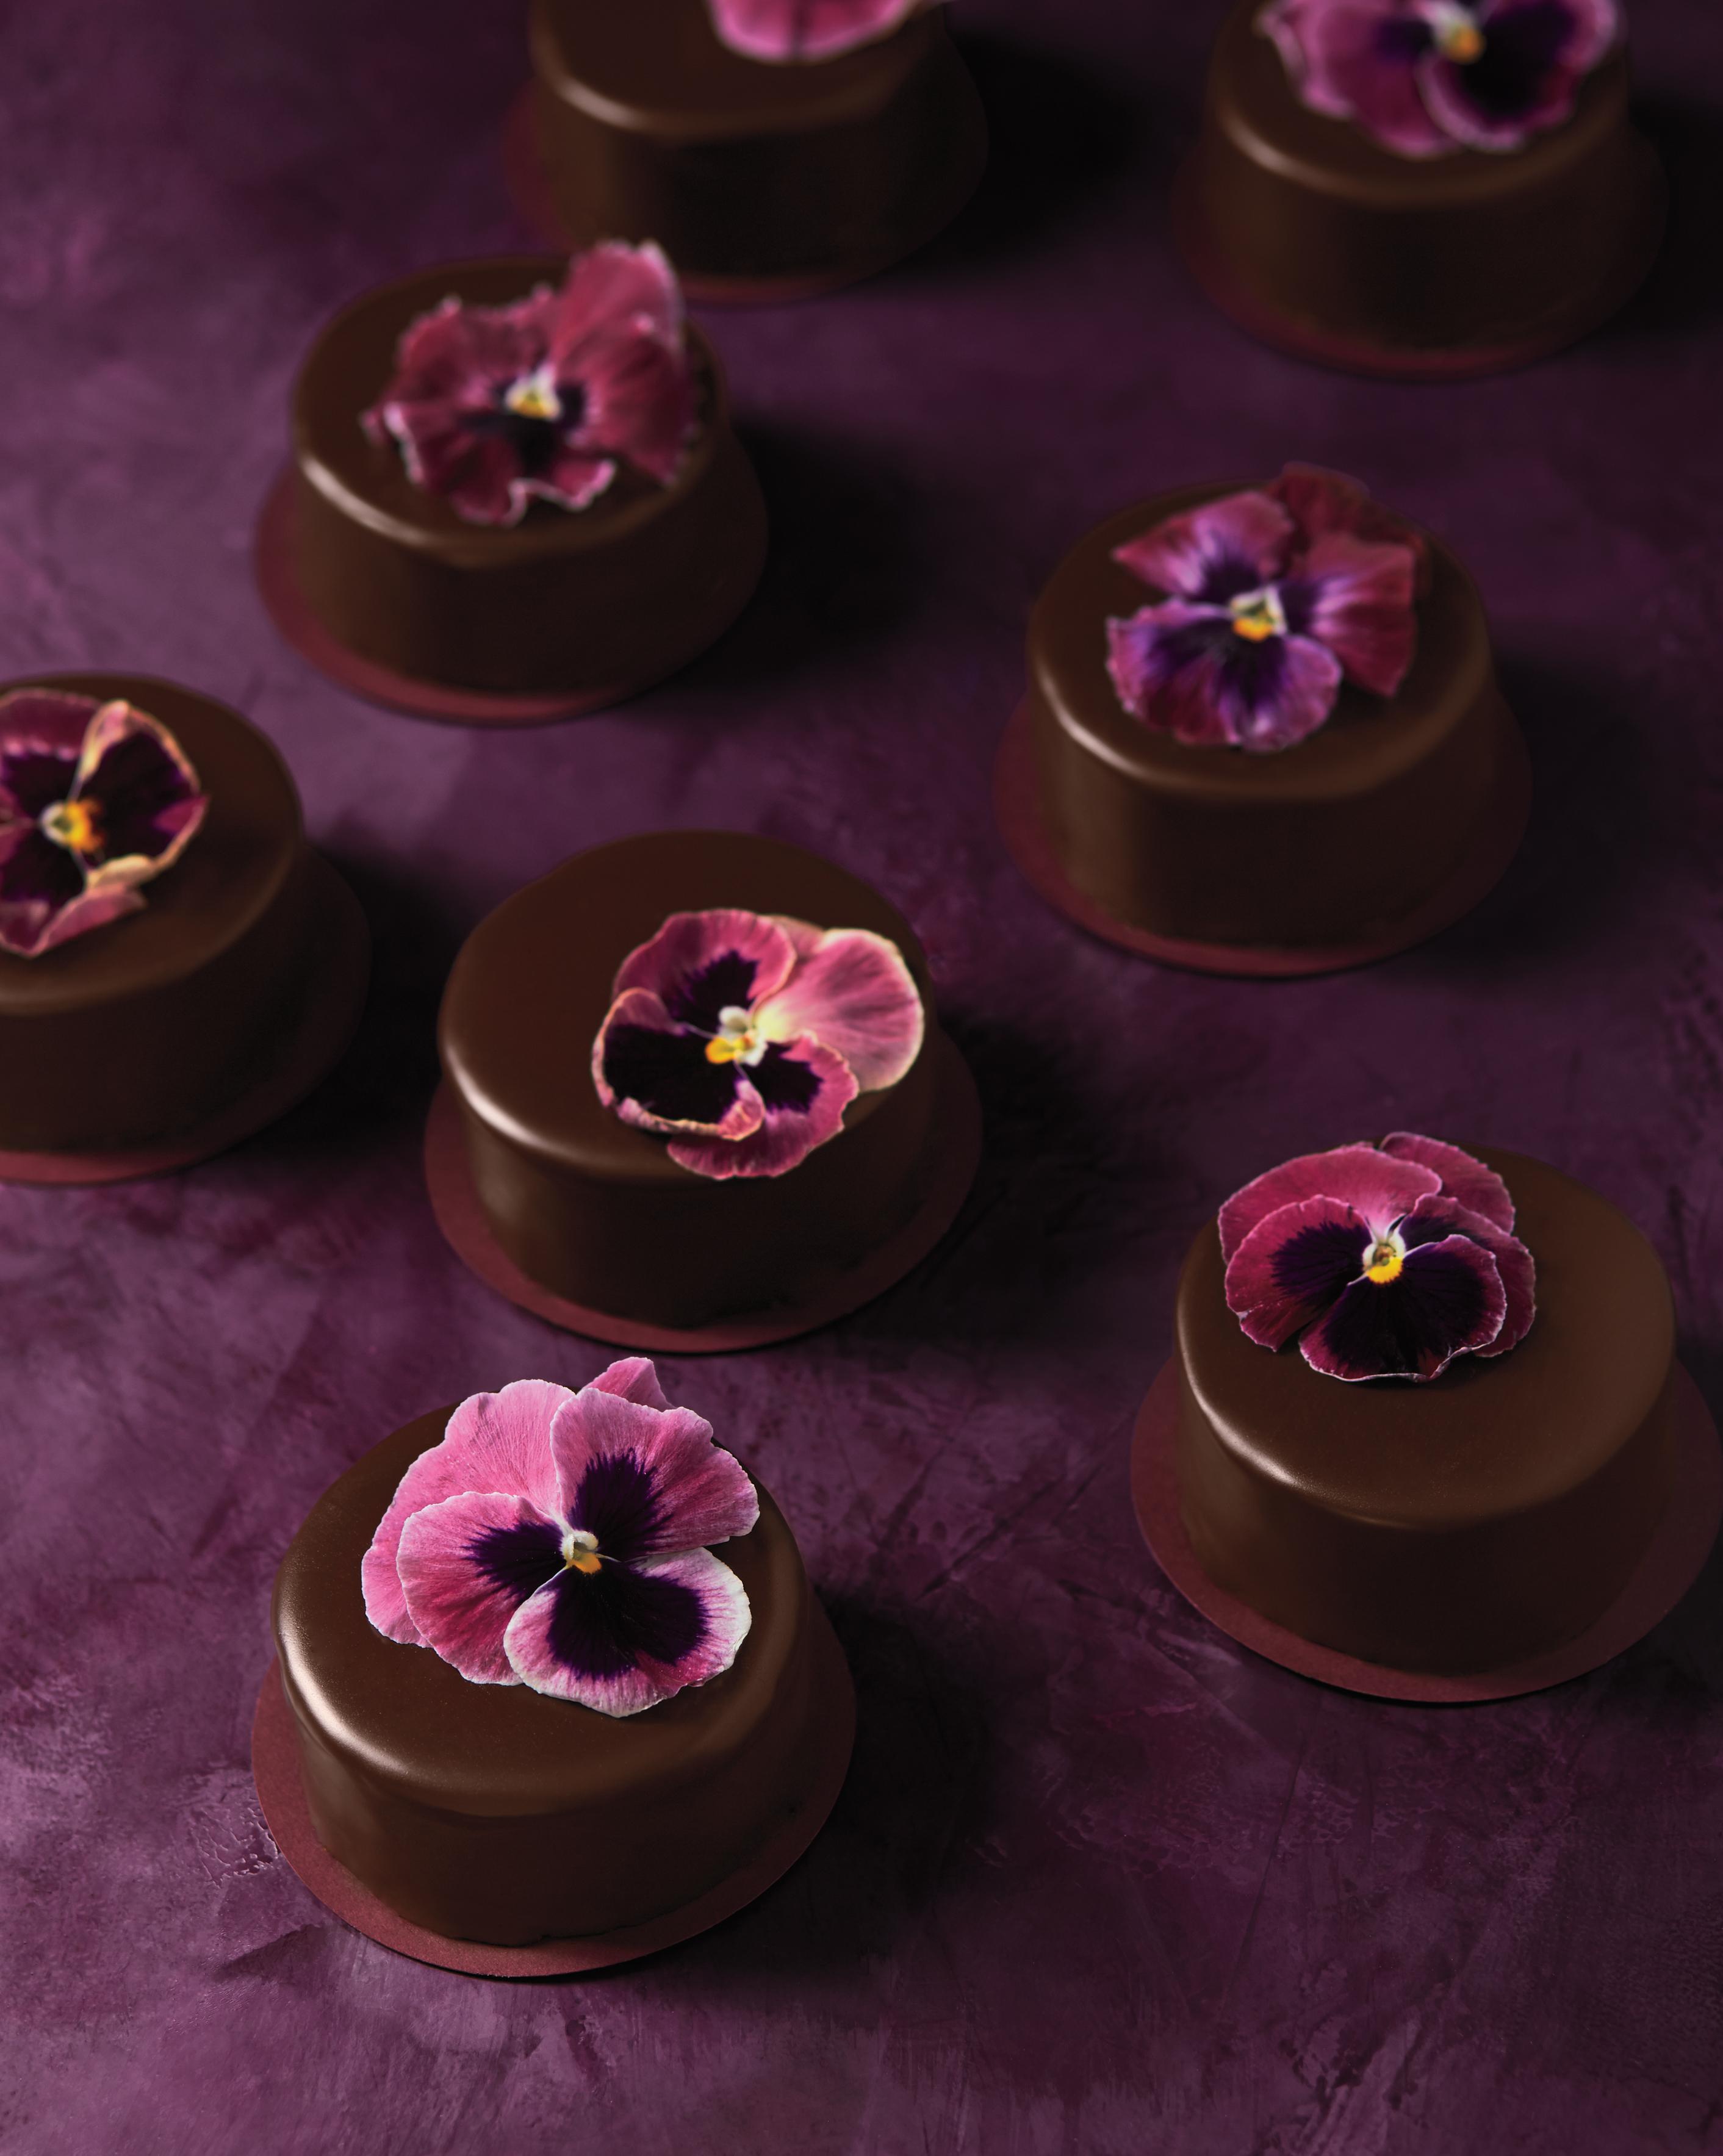 mini-milk-chocolate-wedding-cakes-125-master-d112282.jpg